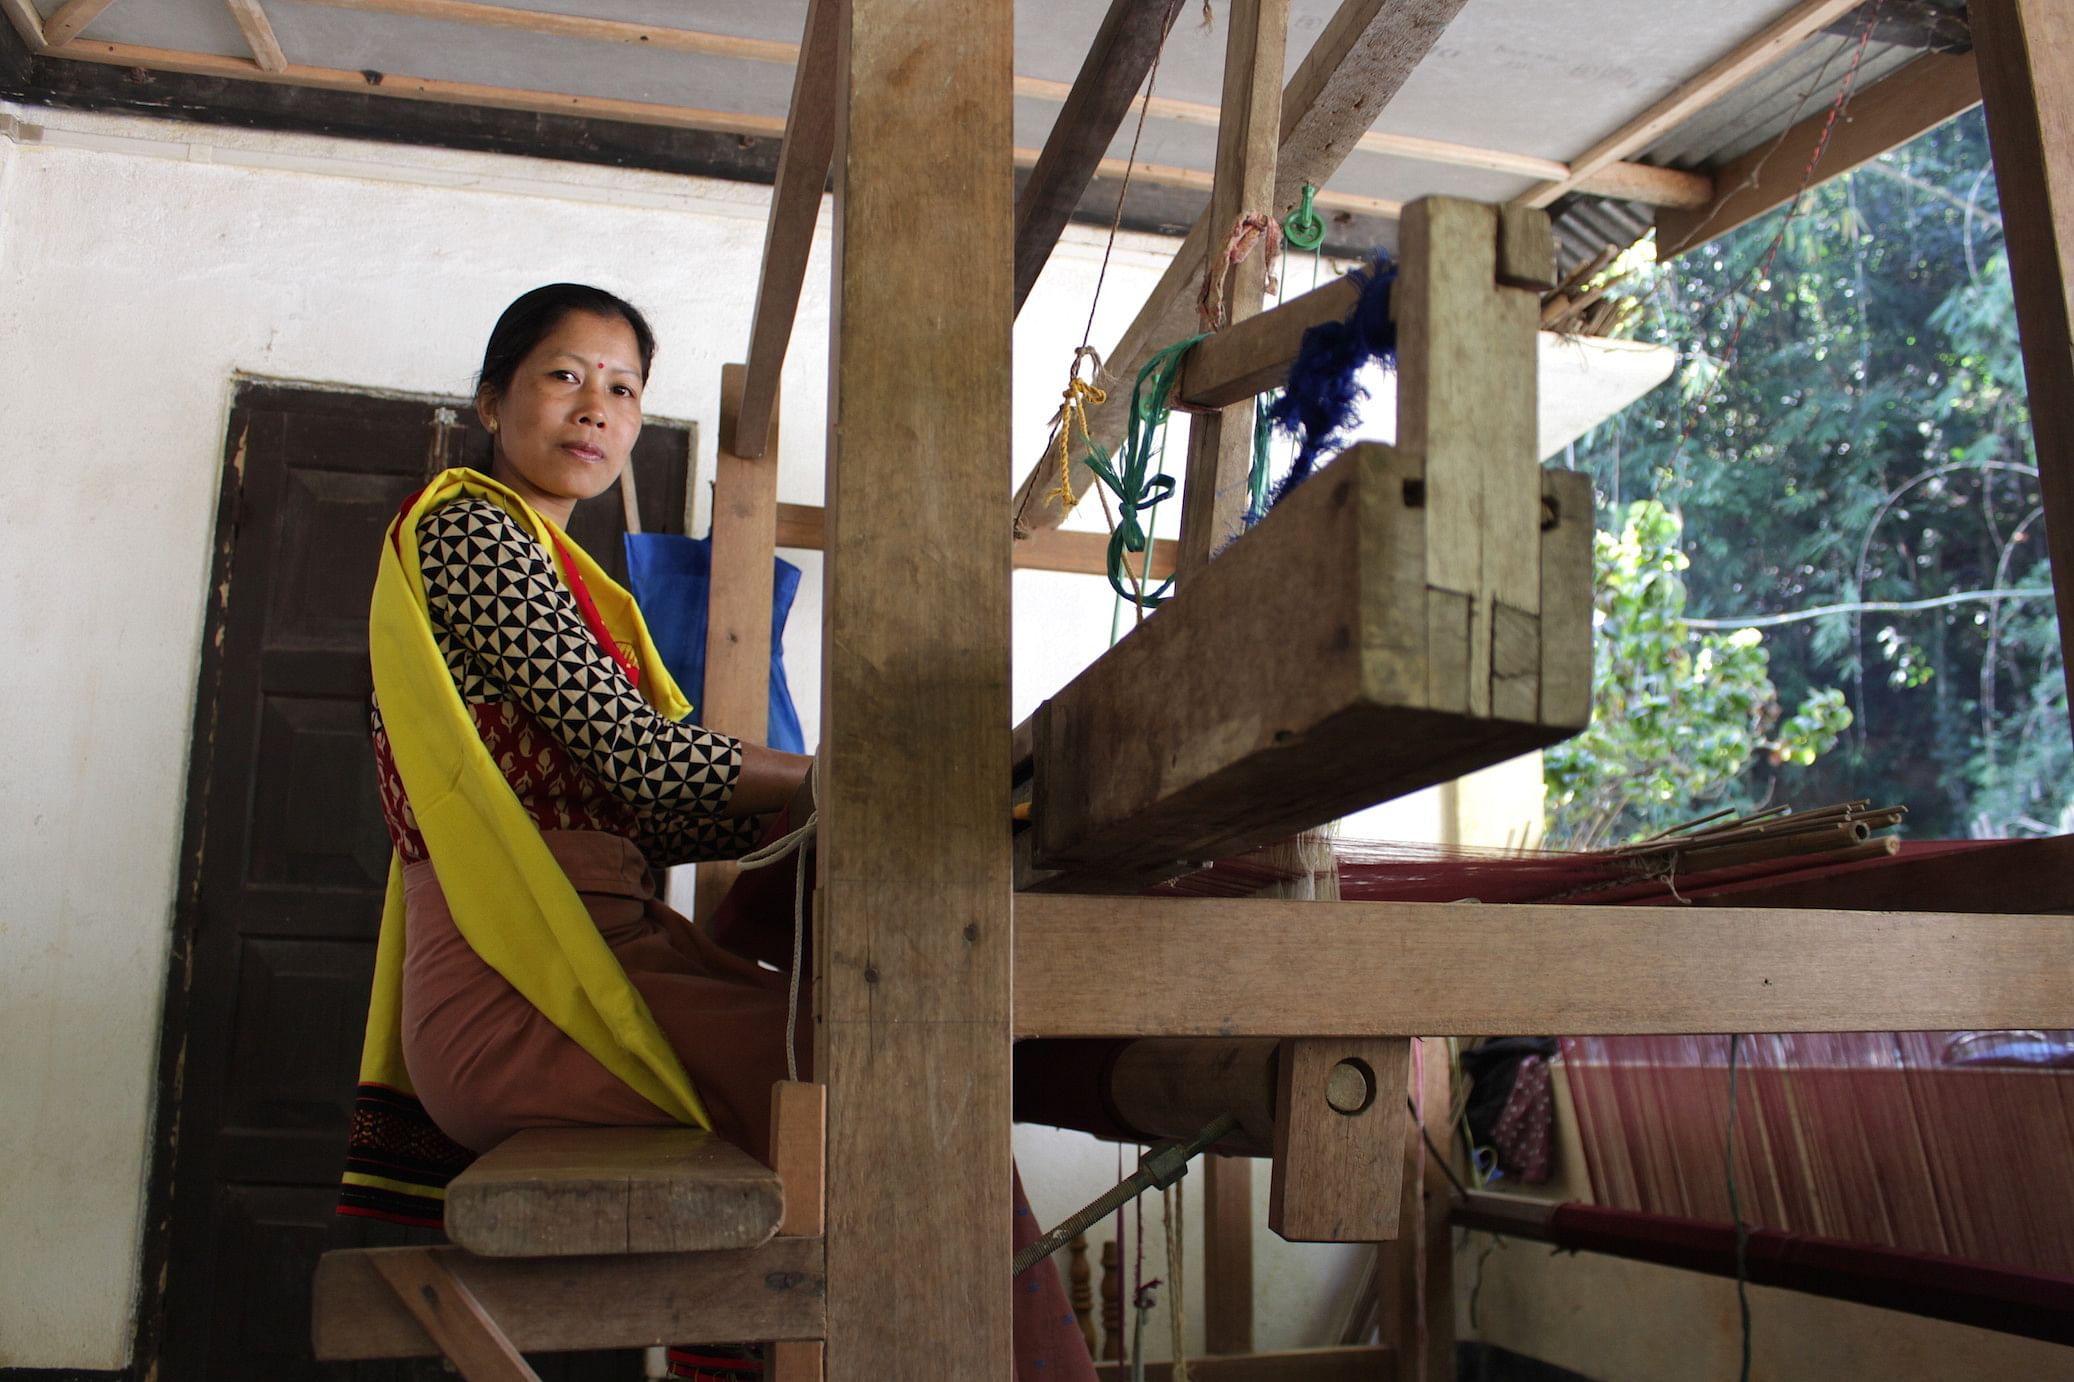 Minali Kemprai, a weaver associated with ROOHI